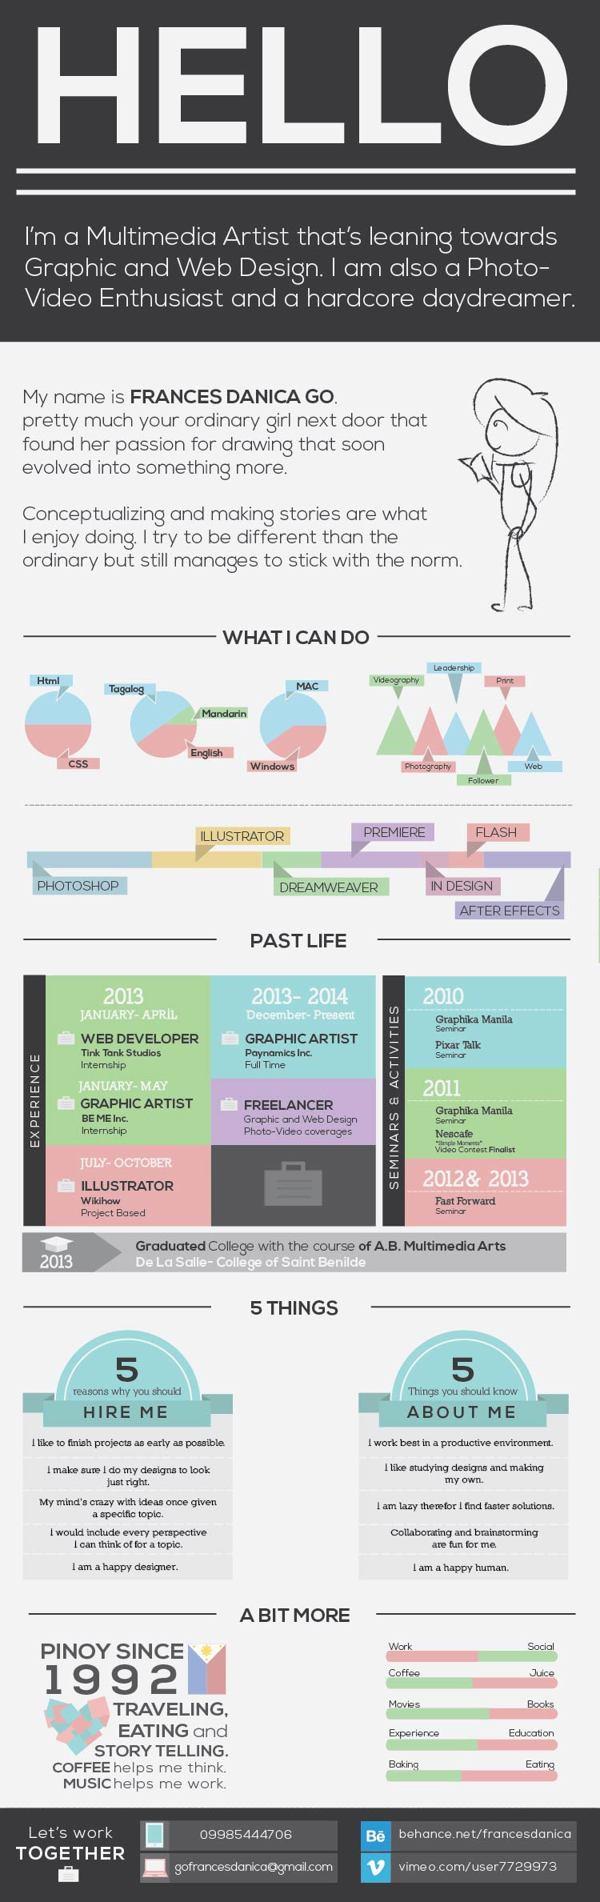 Creative Resume April 2014 on Behance | CV Templates | Pinterest ...